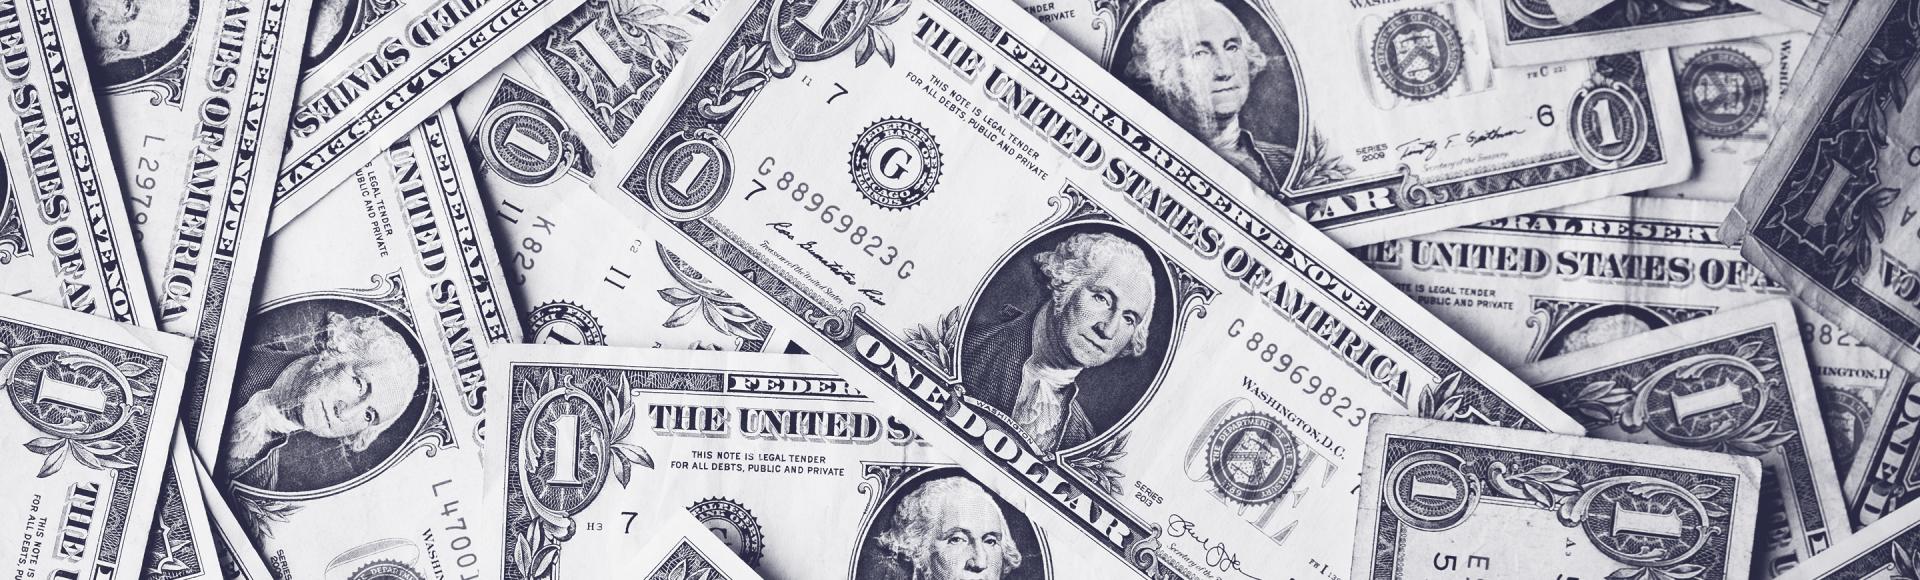 ARK-Invest_Blog-Banner_2017_05_04---Data-from-Cash-Disruption